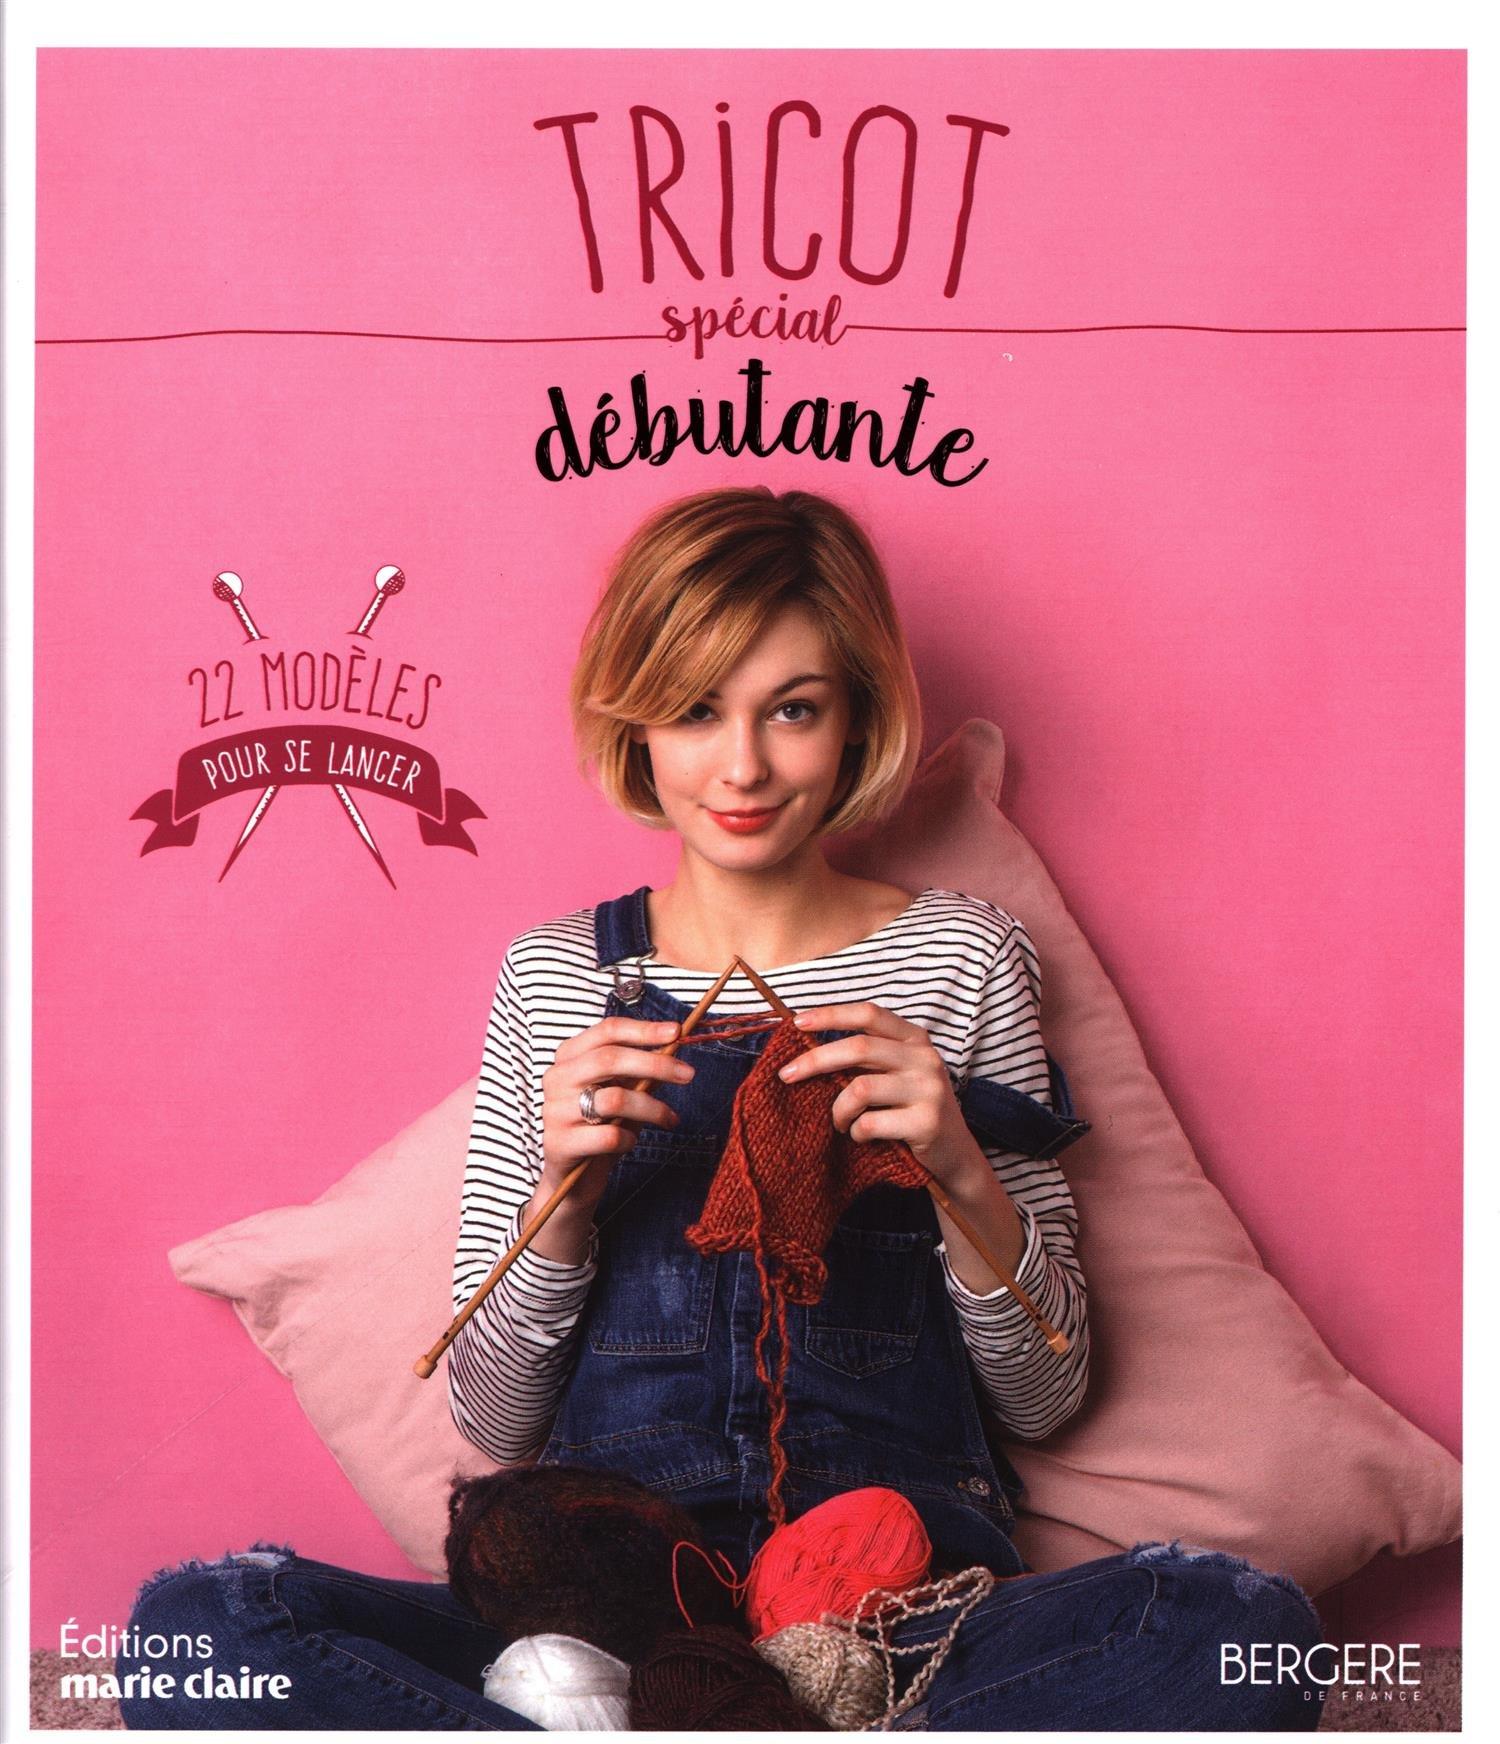 6ecd981a472 Amazon.fr - Tricot spécial débutante - Catherine Guidicelli ...